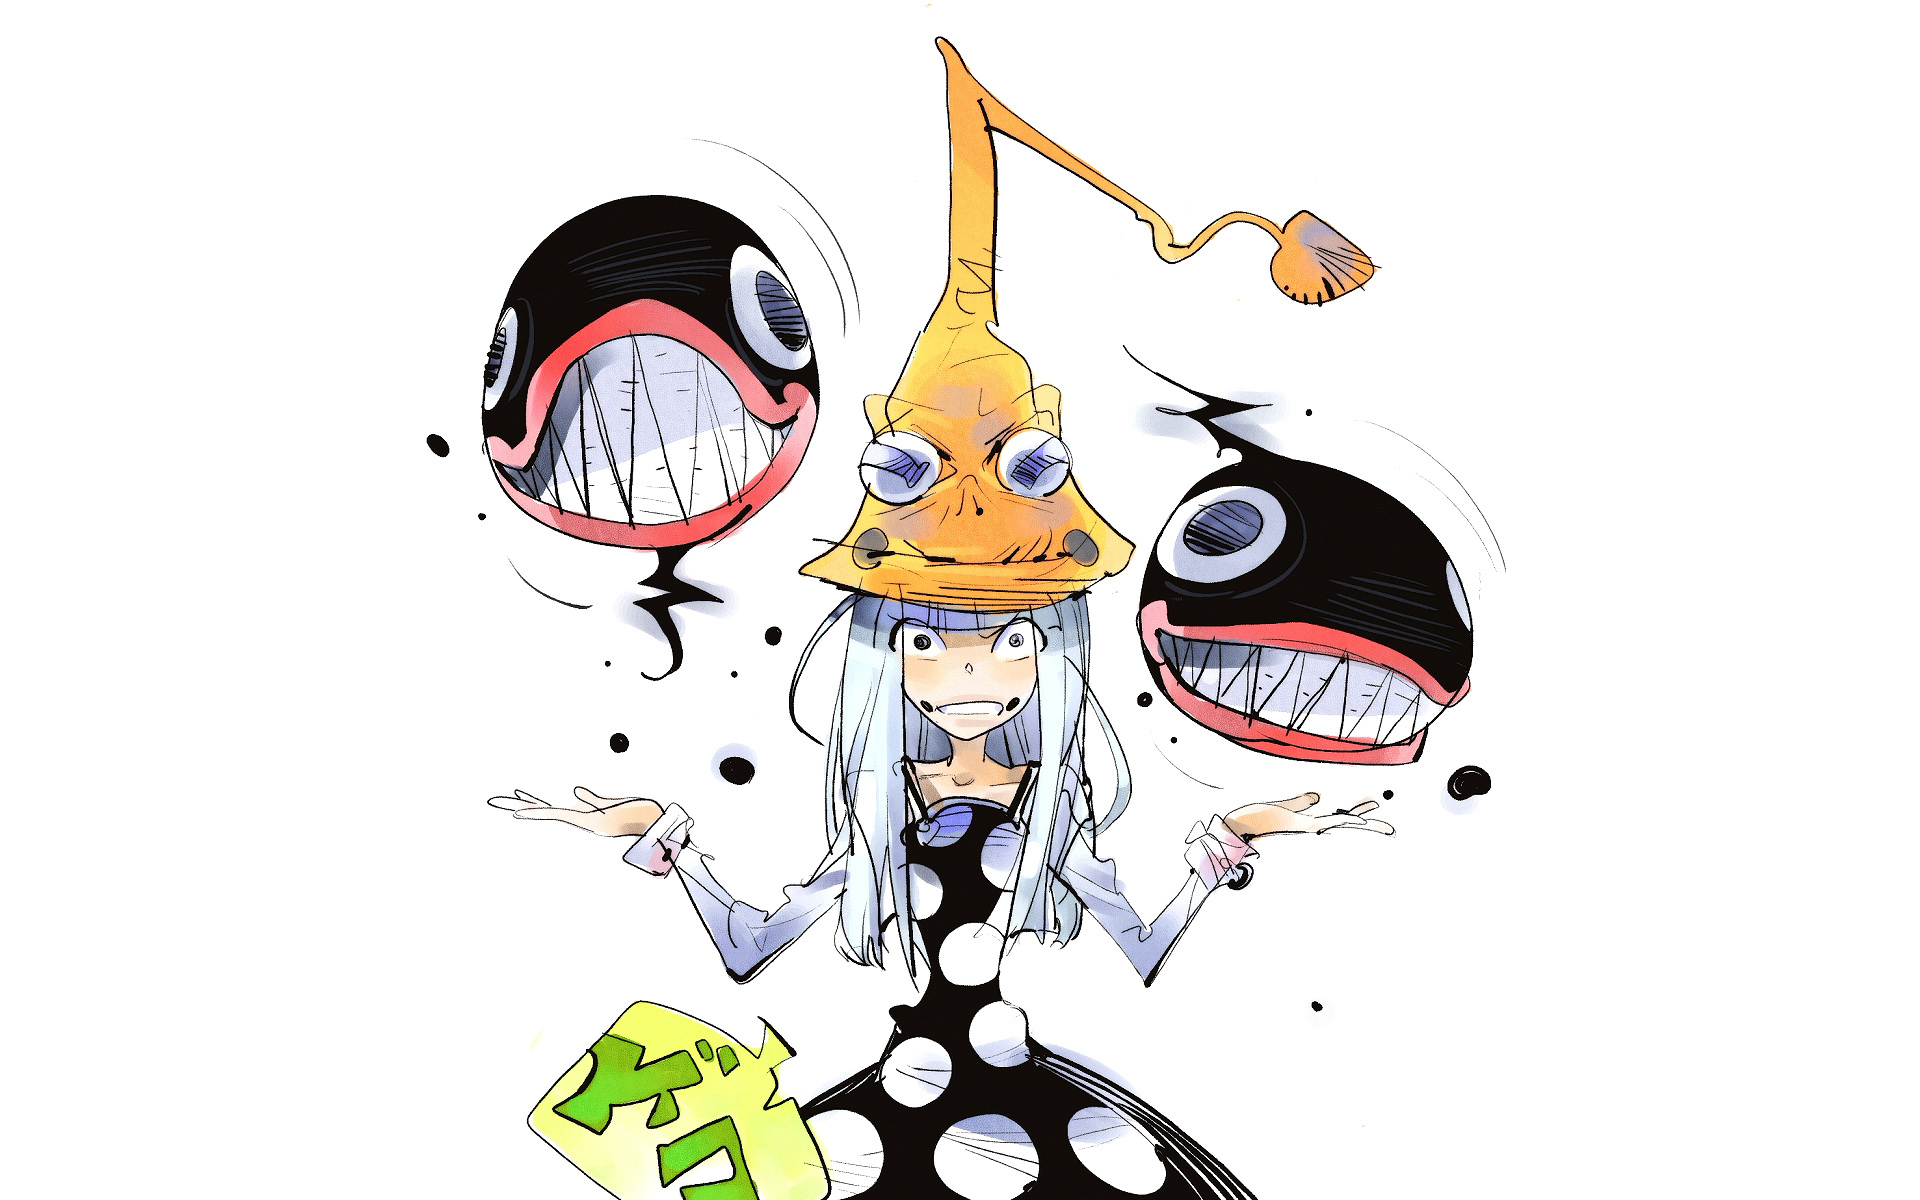 Anime por halloween - 1920x1200